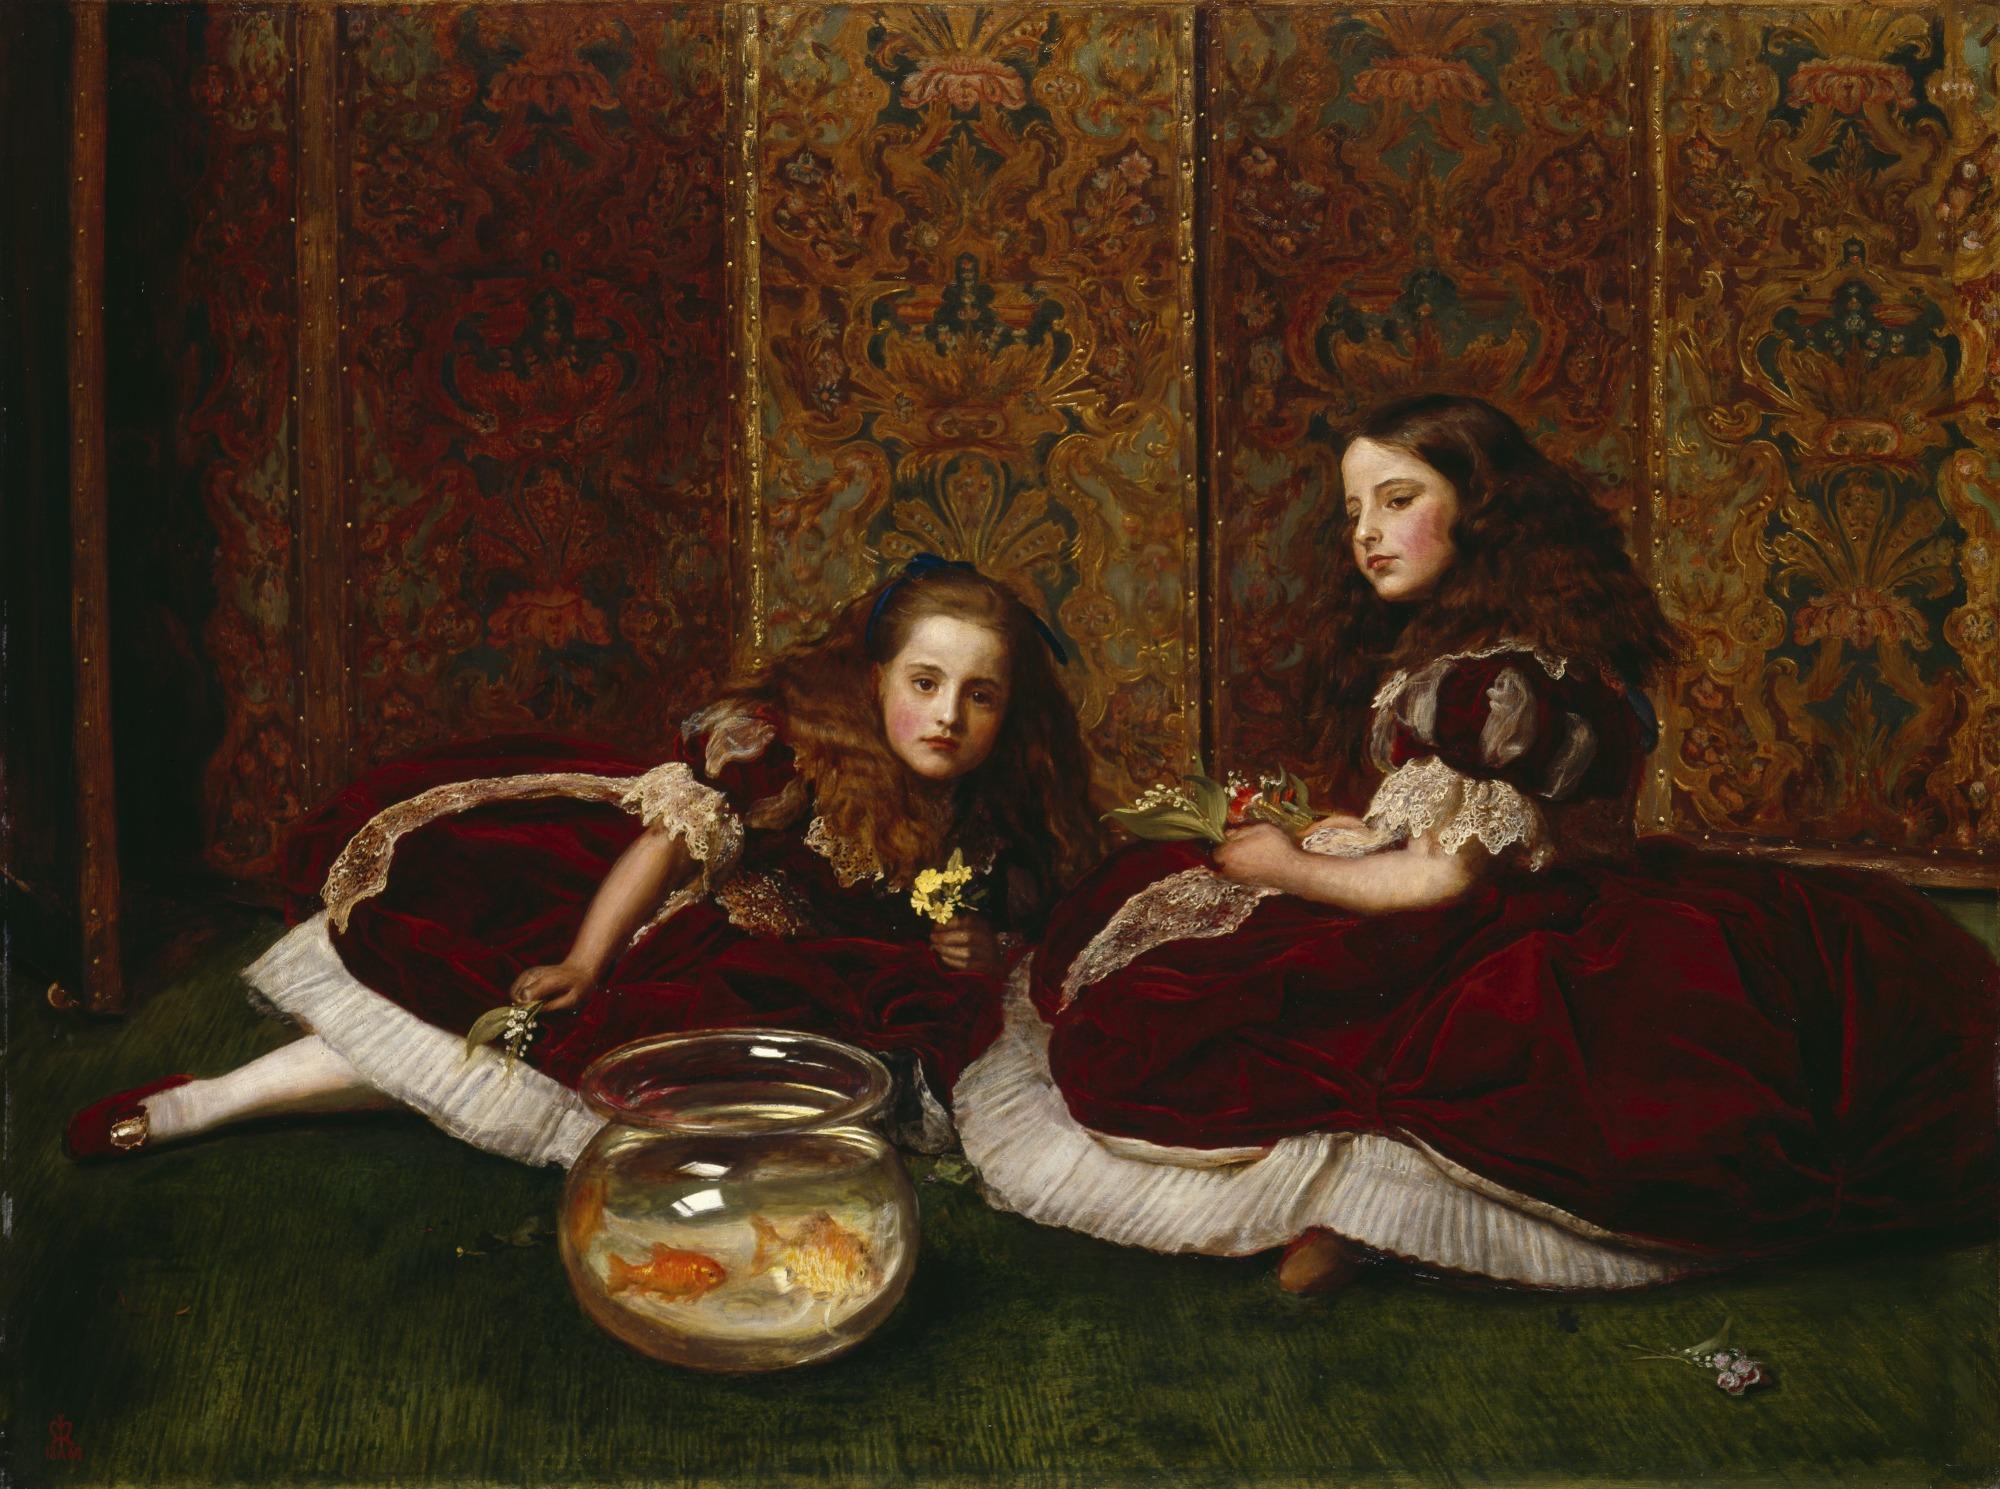 John Everett Millais - Leisure Hours,1864